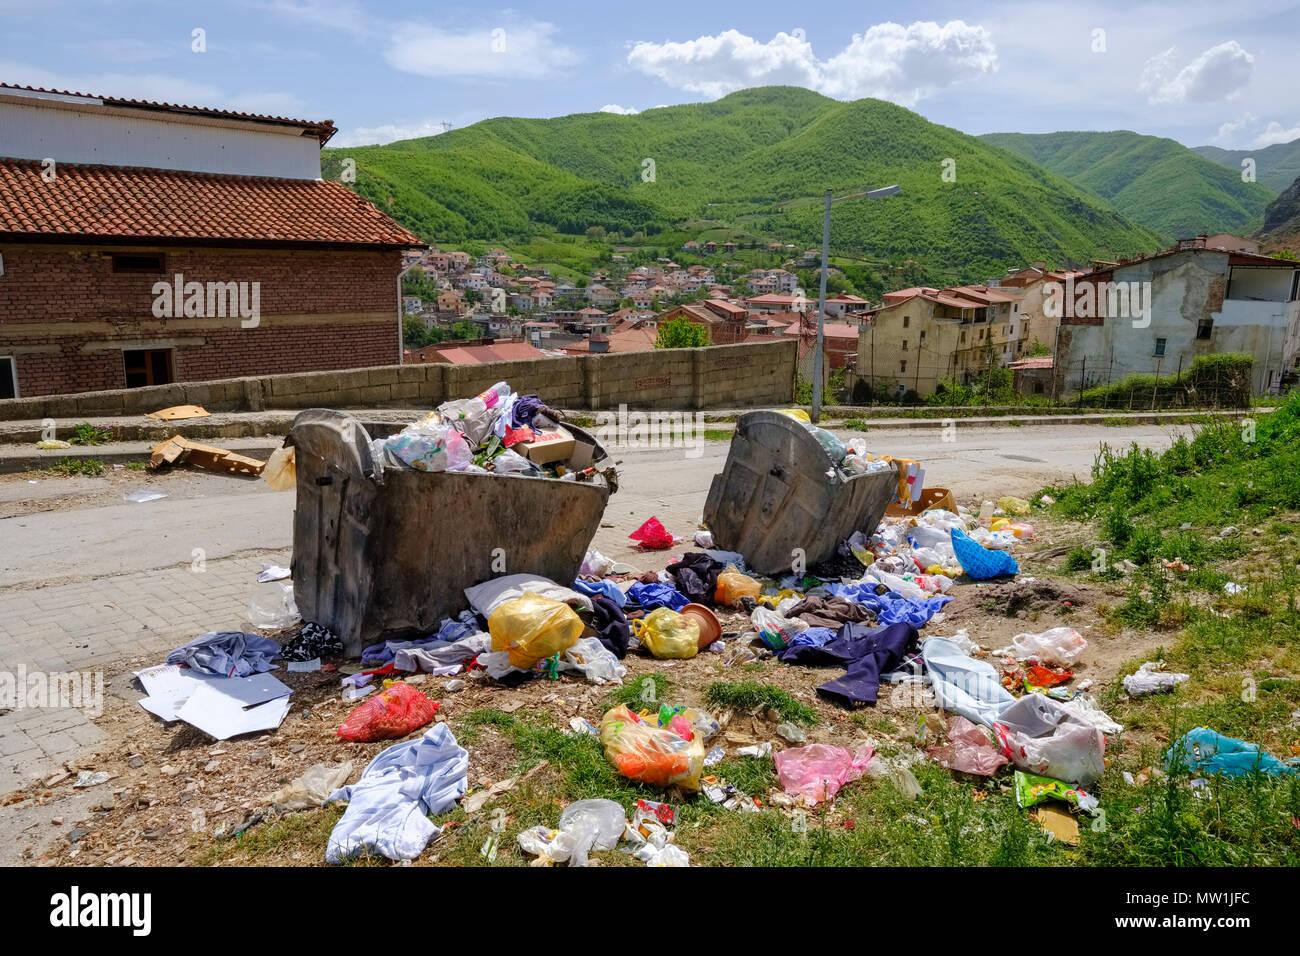 Müll und Abfall Container am Straßenrand, Pogradec am Ohrid-See, Korca region, Albanien Stockbild